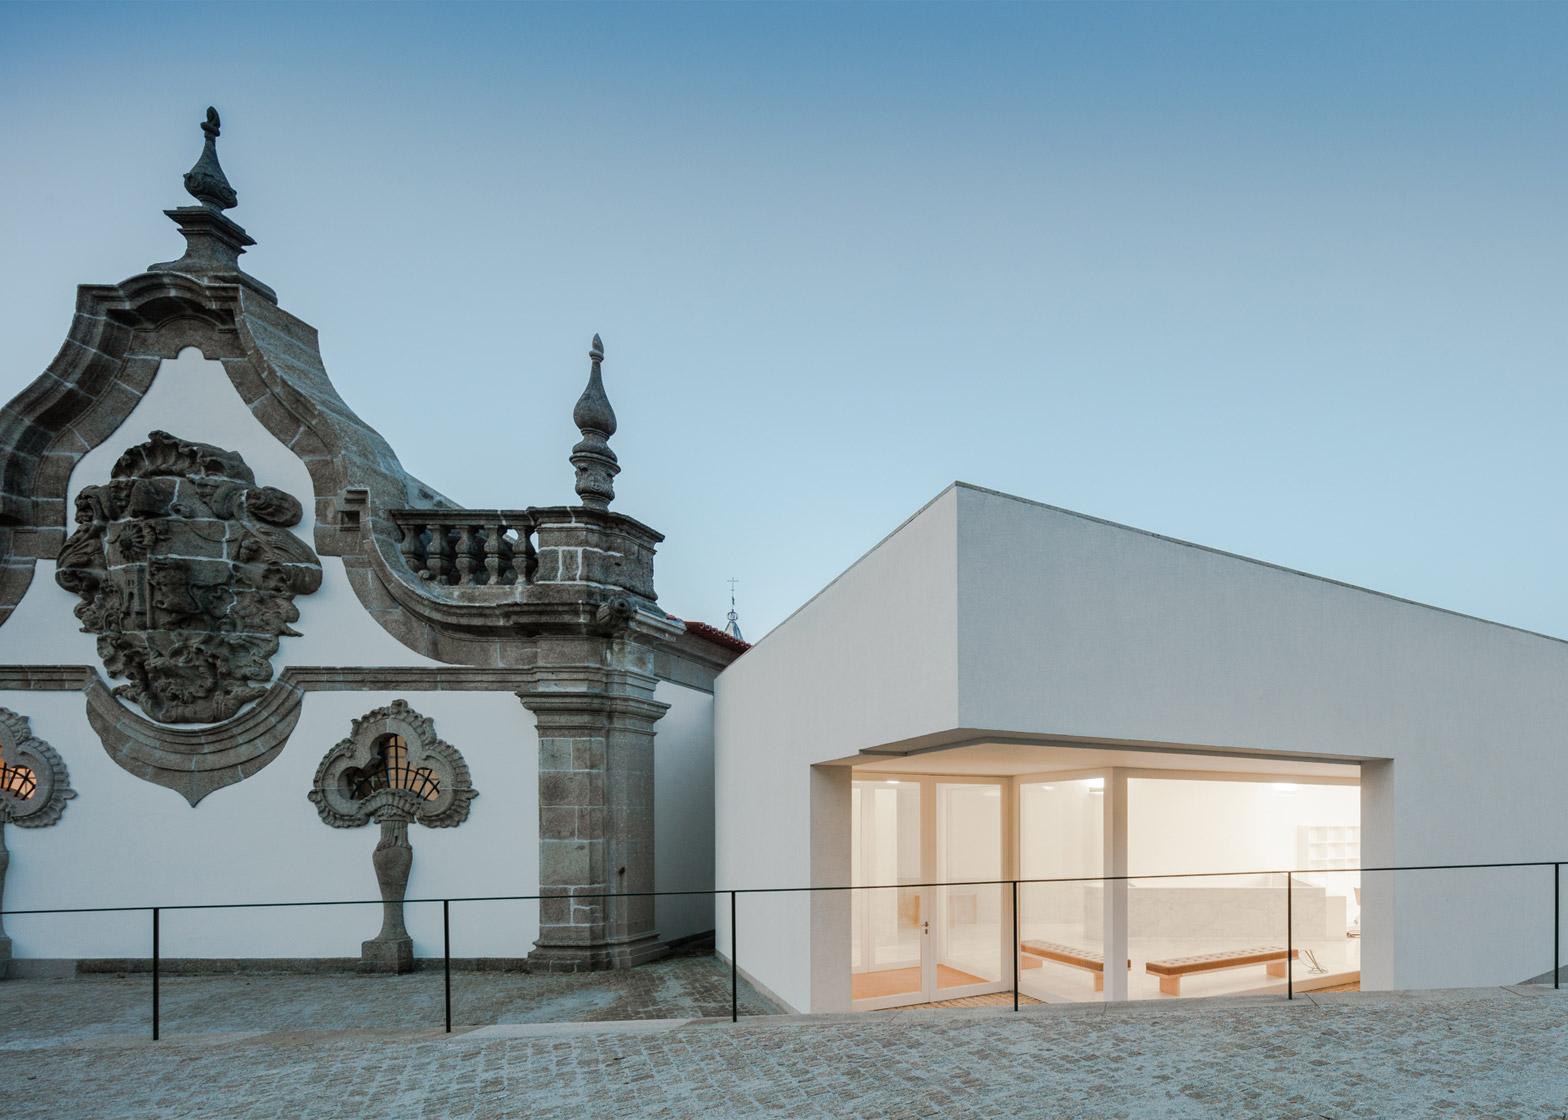 4-premiados-arquitetos-portugueses-se-unem-para-reformar-museu